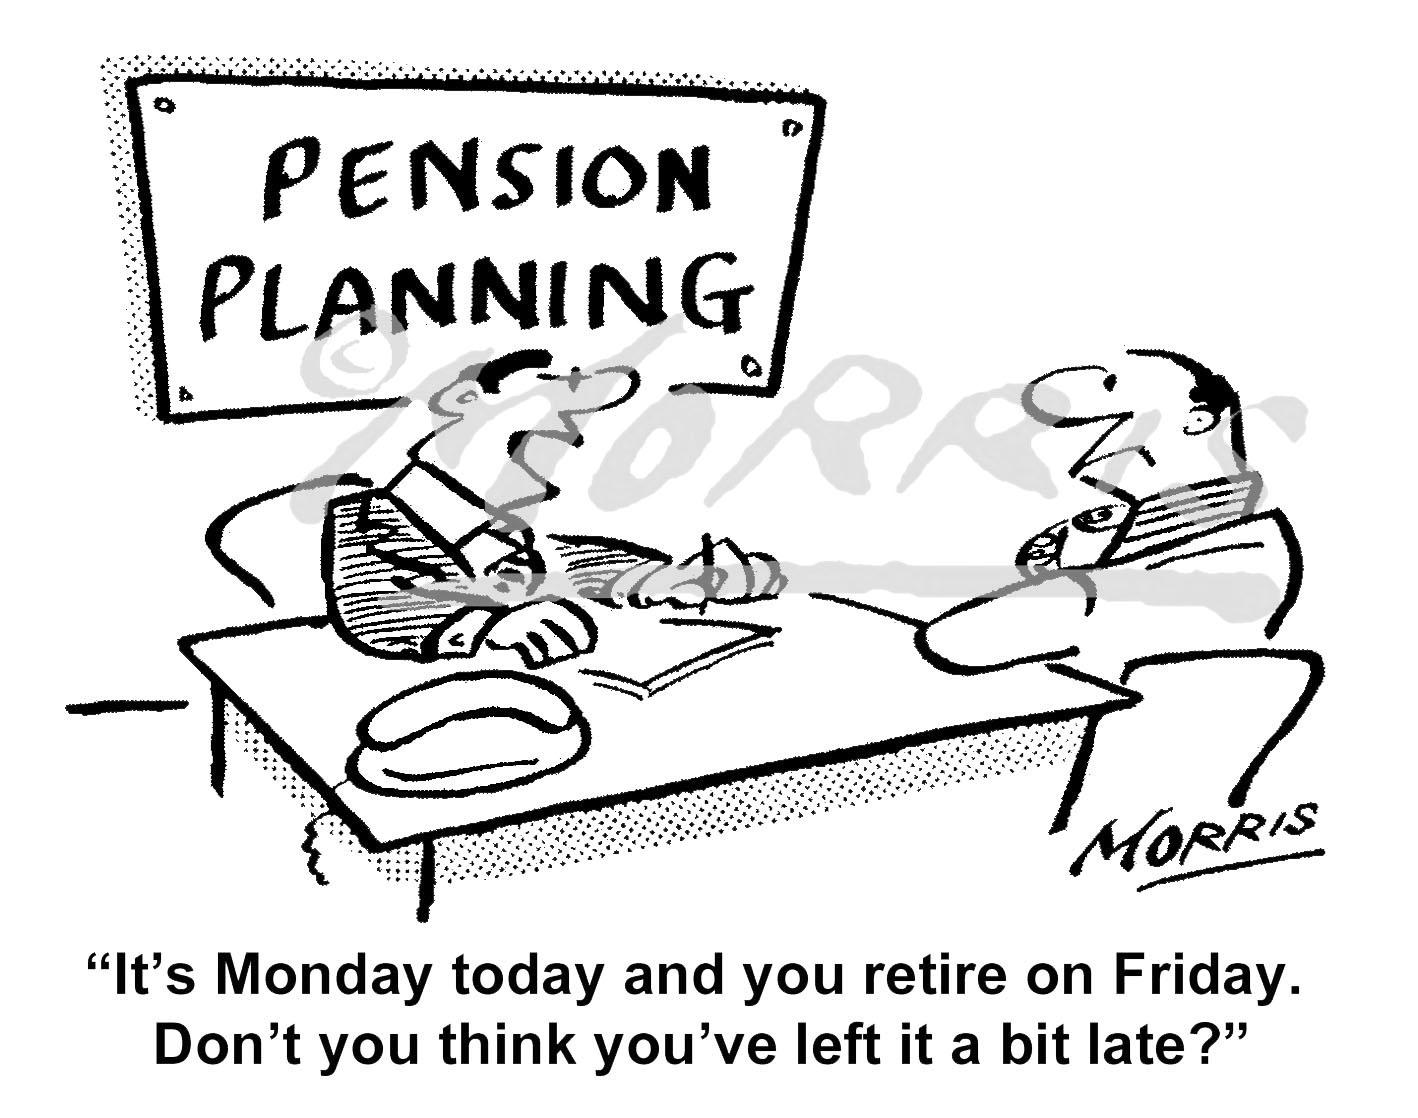 Pension planning retirement cartoon – Ref: 7413bw